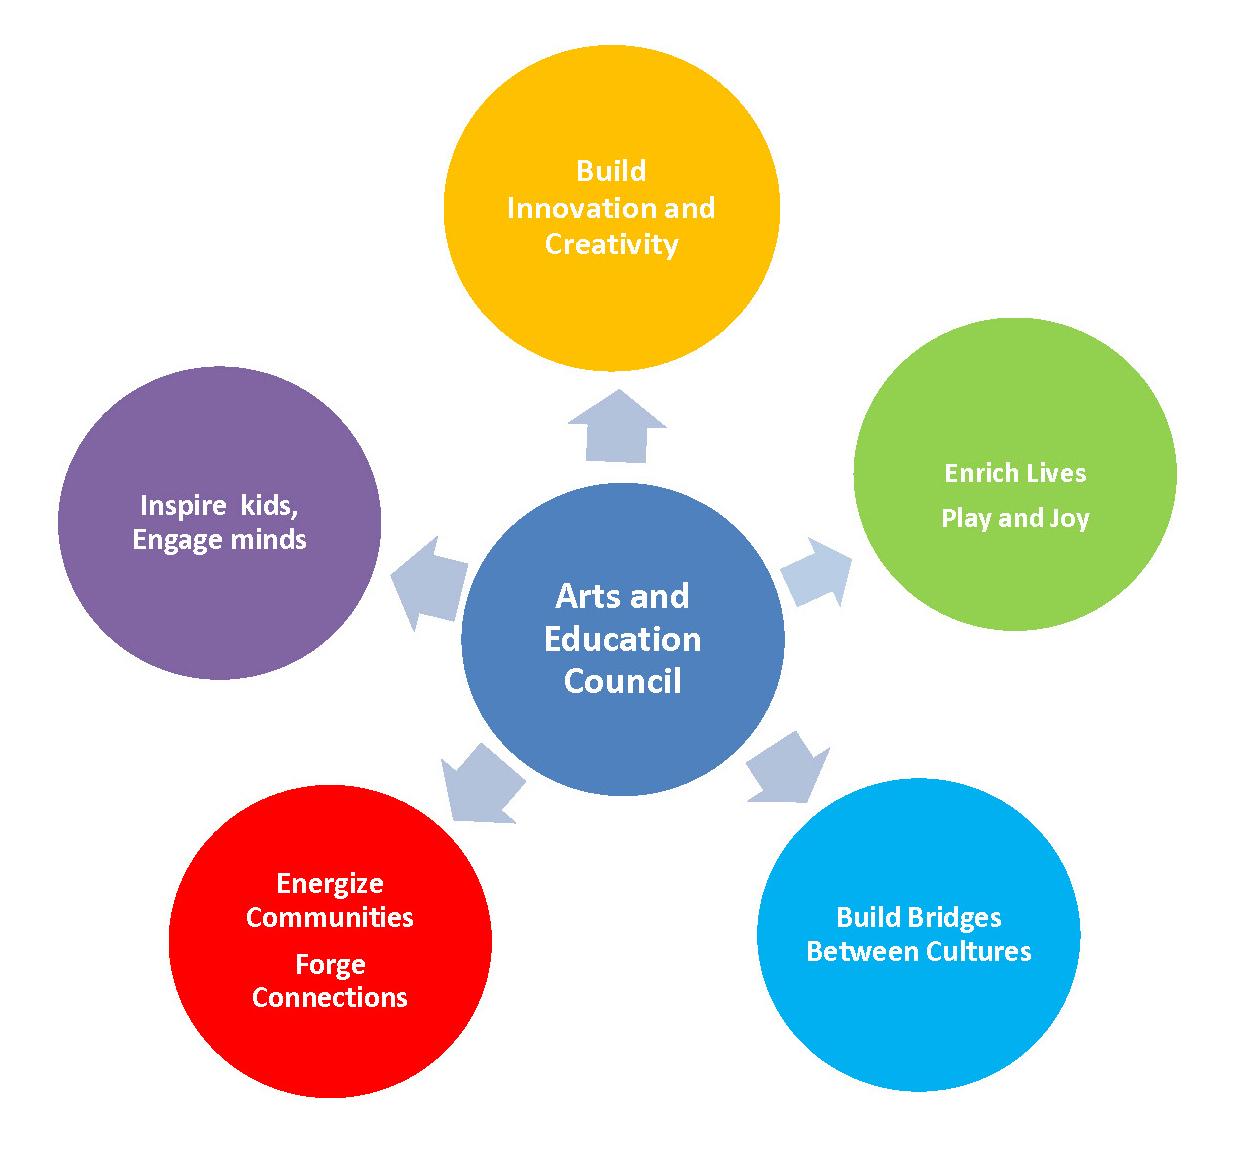 A&E's Elements of a Vibrant Community